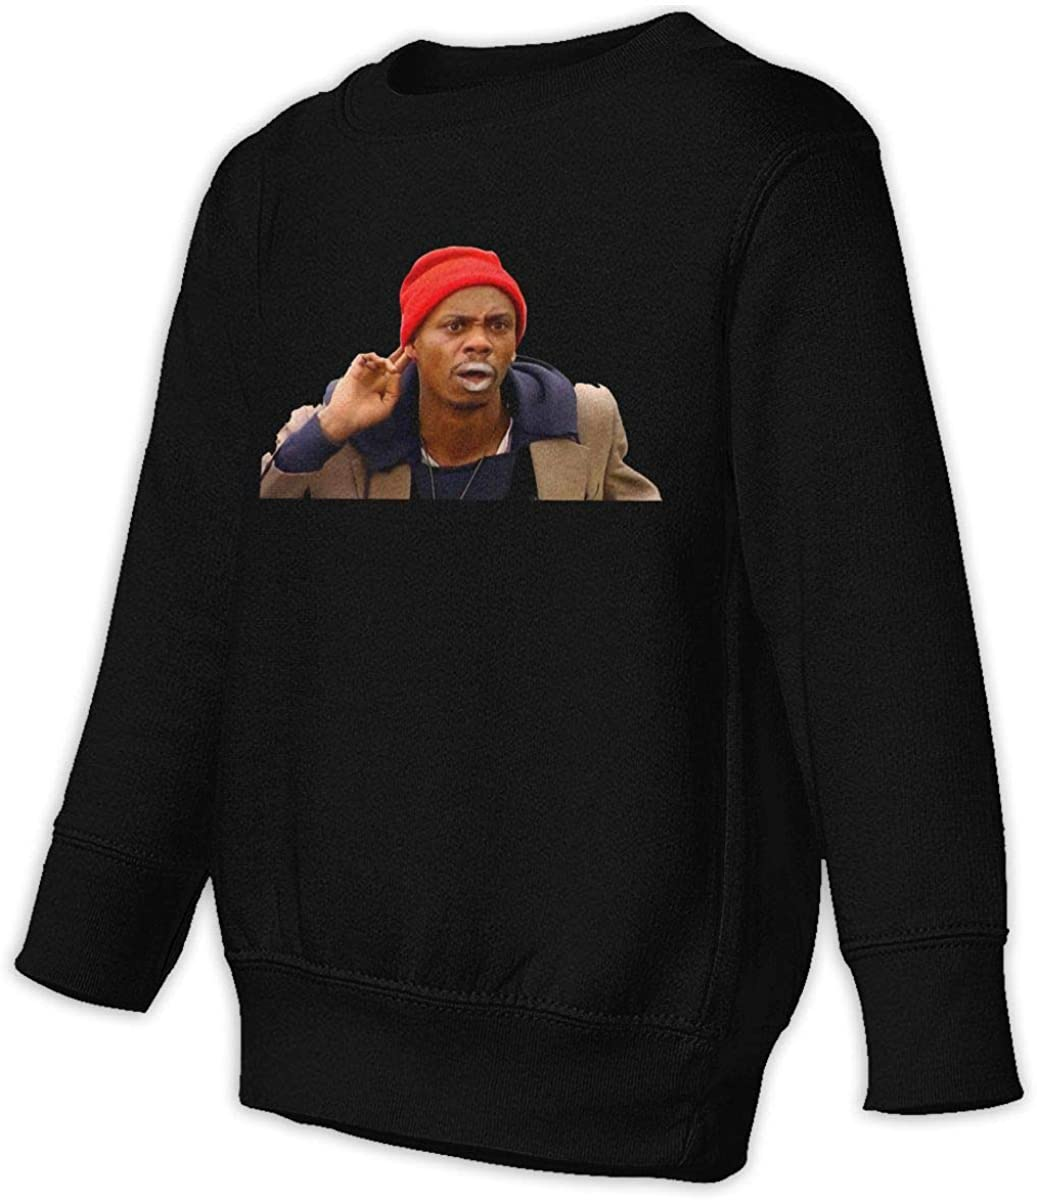 POPLNMUSM-hosvuns Dave Chappelle - Tyrone Biggums Unisex Sweatshirt Youth Boy and Girls Pullover Sweatshirt Black